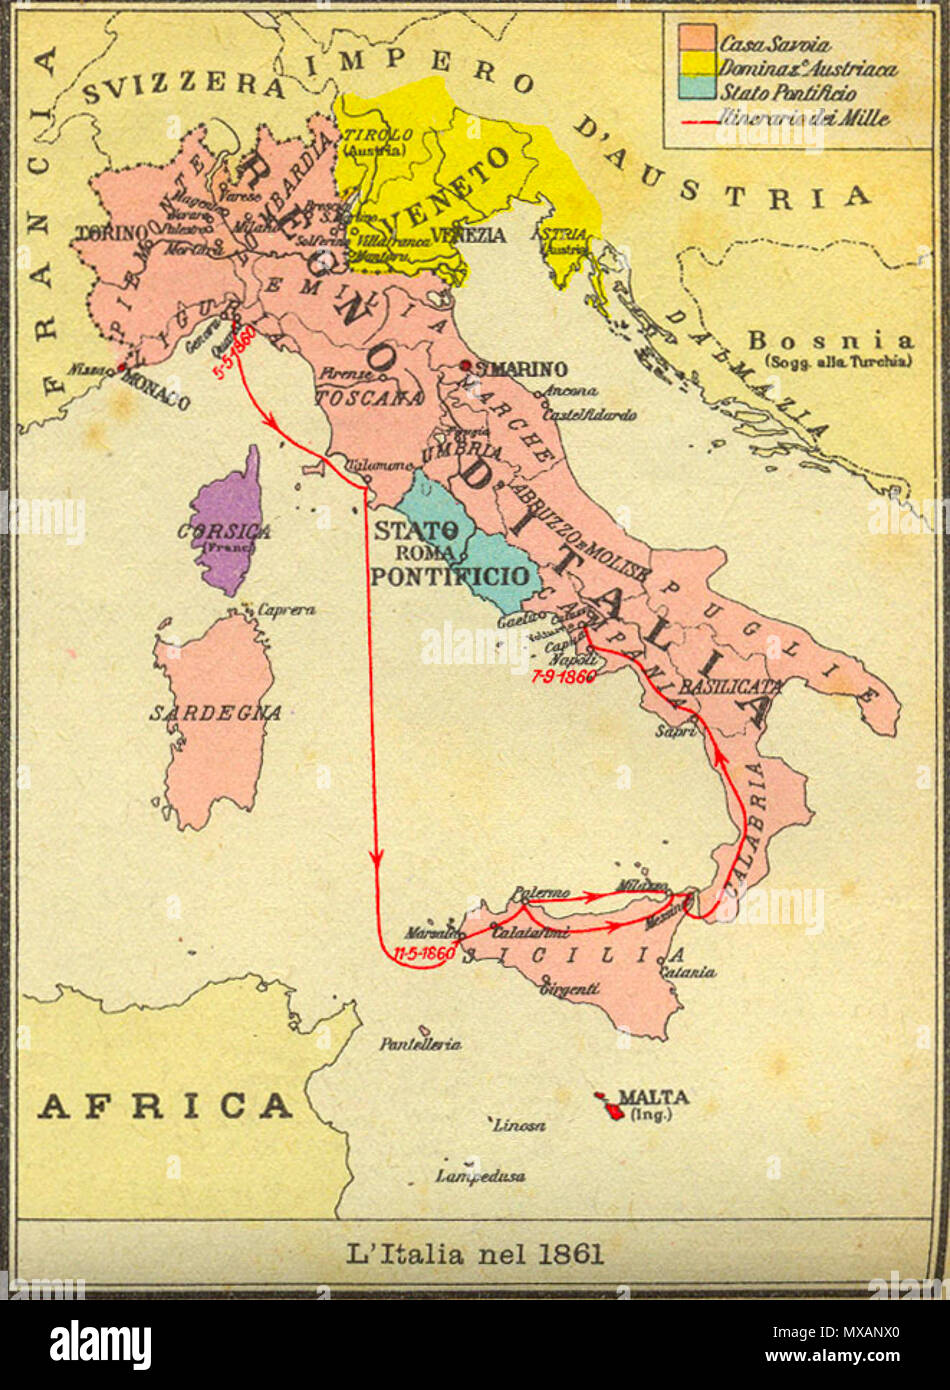 Cartina Africa In Italiano.English Italy 1861 Map Italiano Mappa D Italia Al 1861 Unknown 302 Italia Al 1861 Stock Photo Alamy